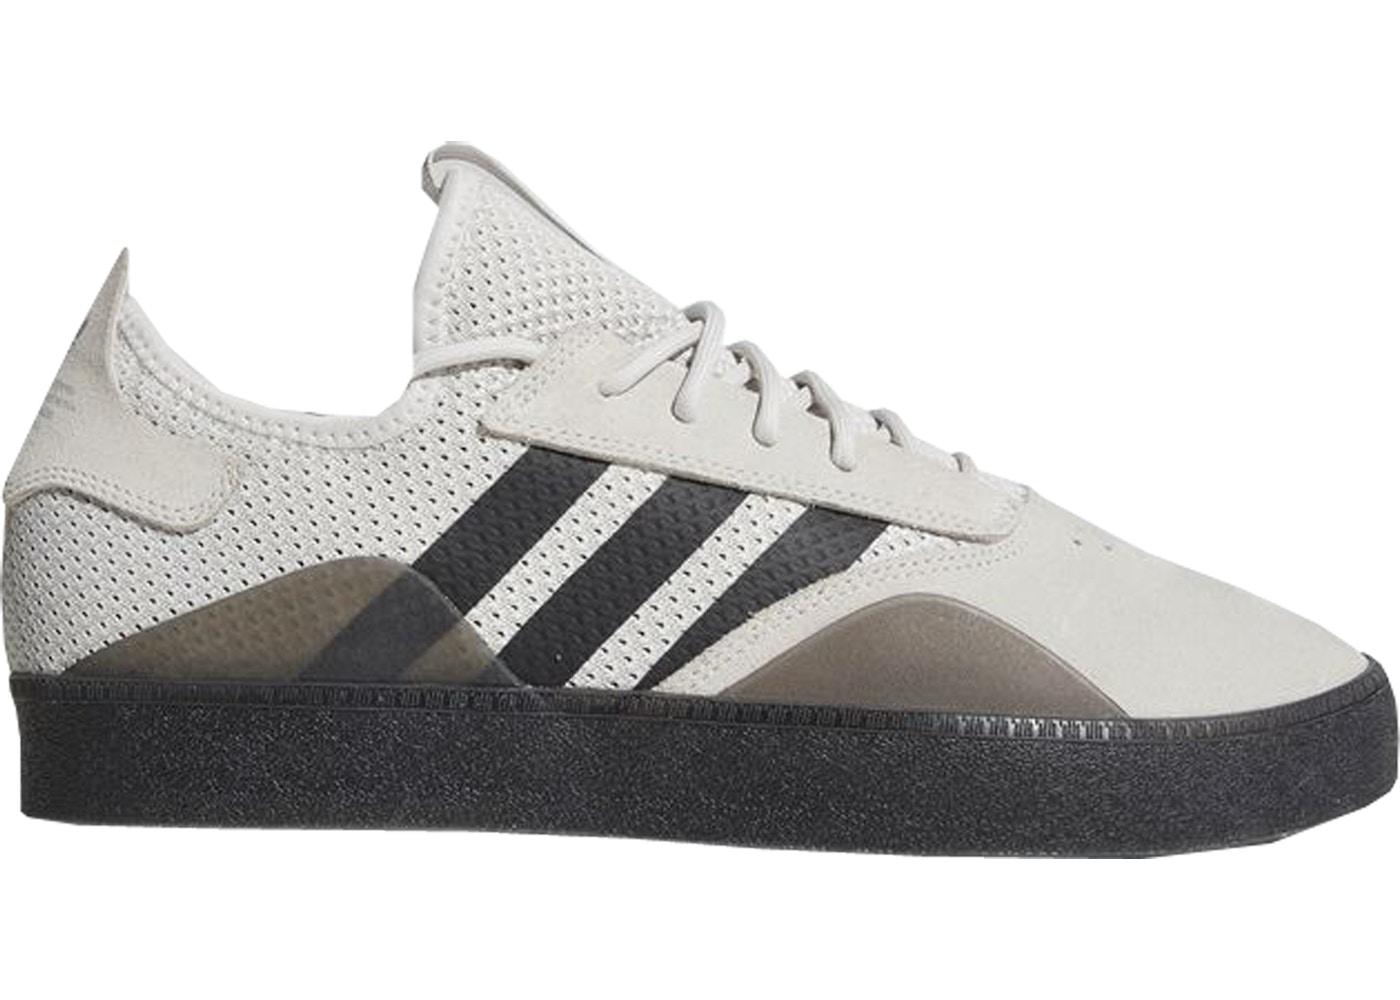 adidas Originals Tubular Shadow Men's Casual Trainers Shoes